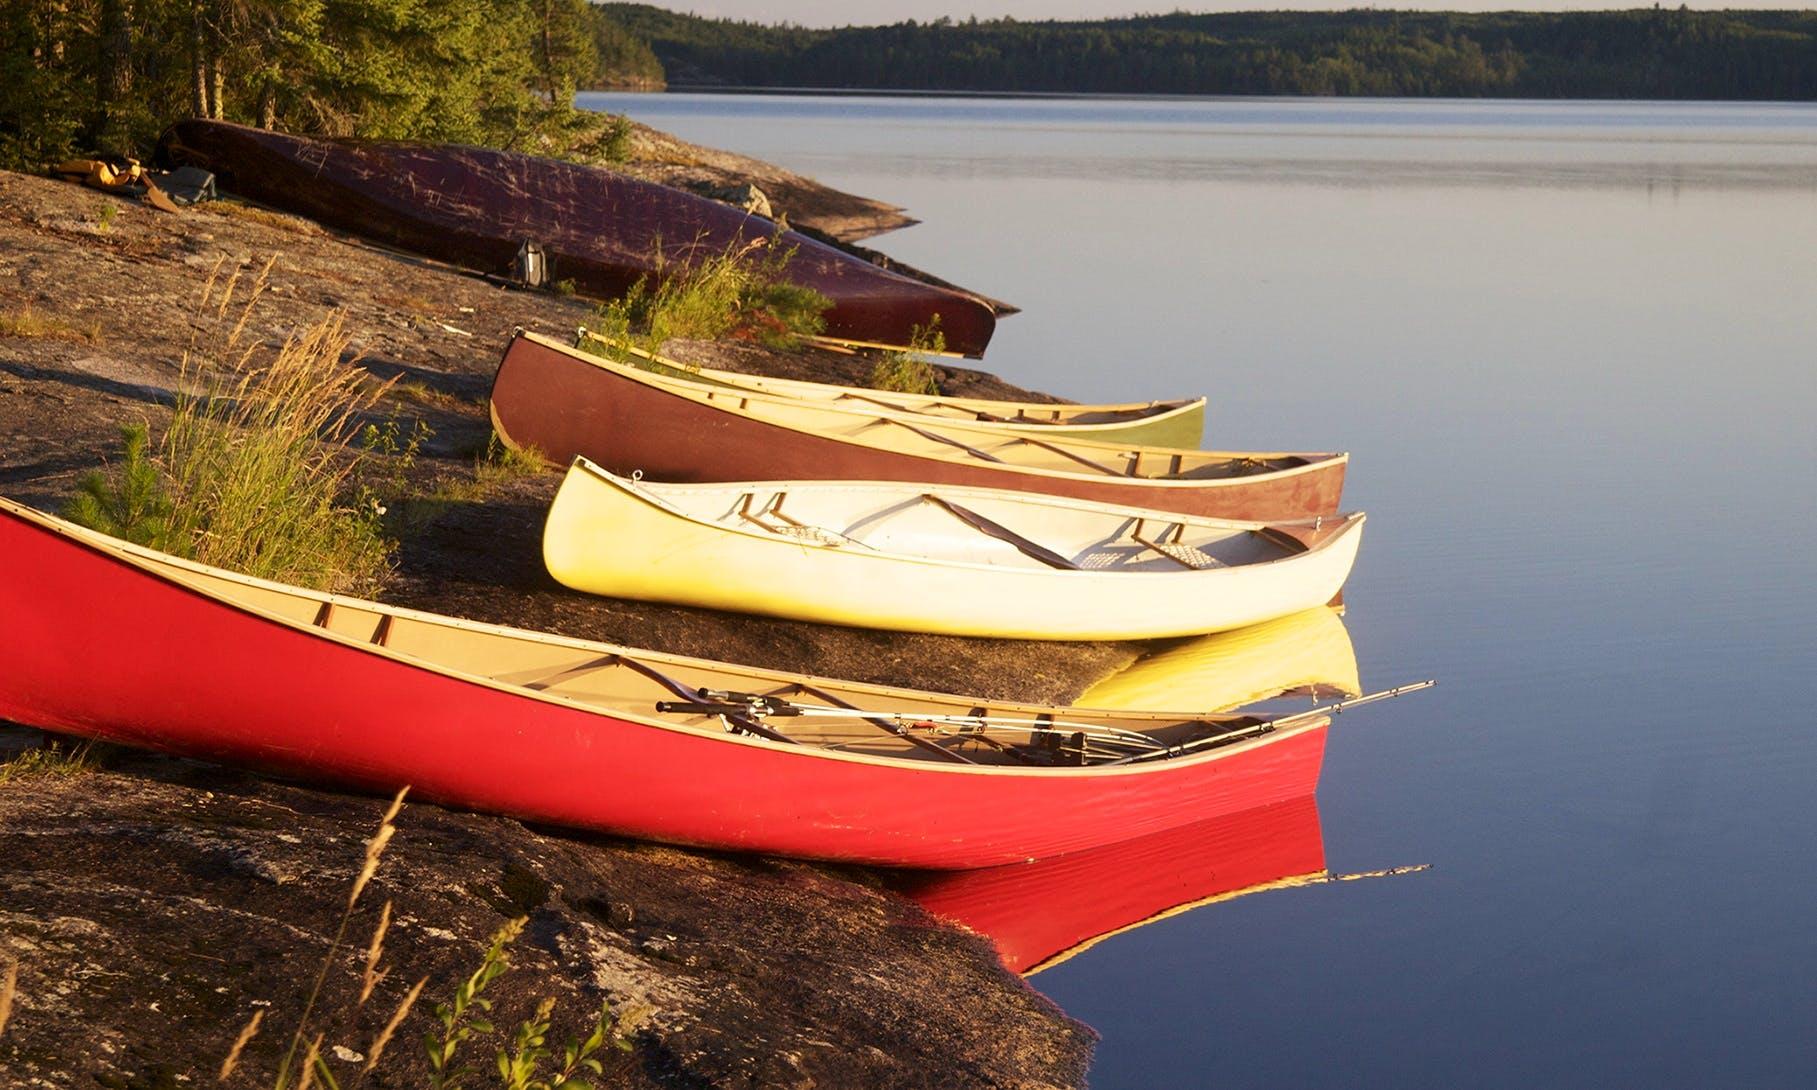 Canoe Rental in British Columbia, Canada